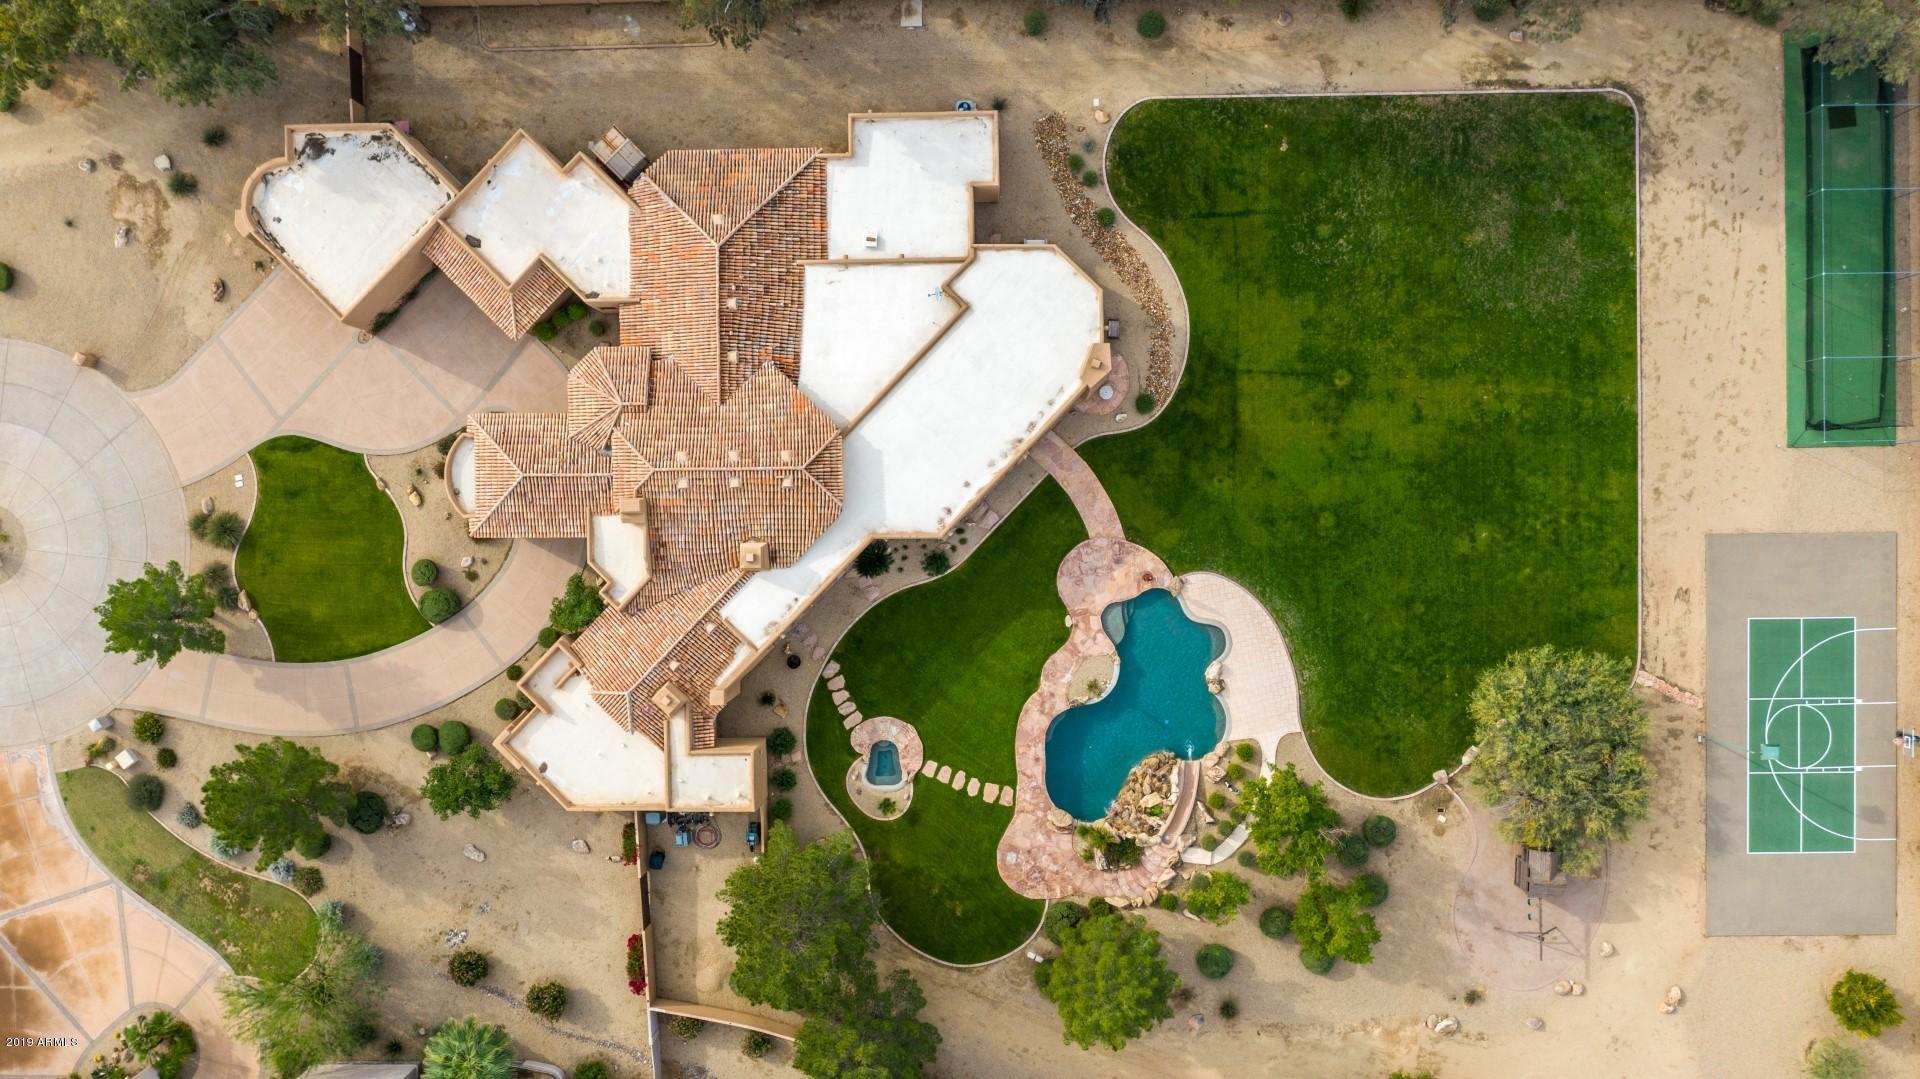 10182 E Cactus Rd Scottsdale, AZ